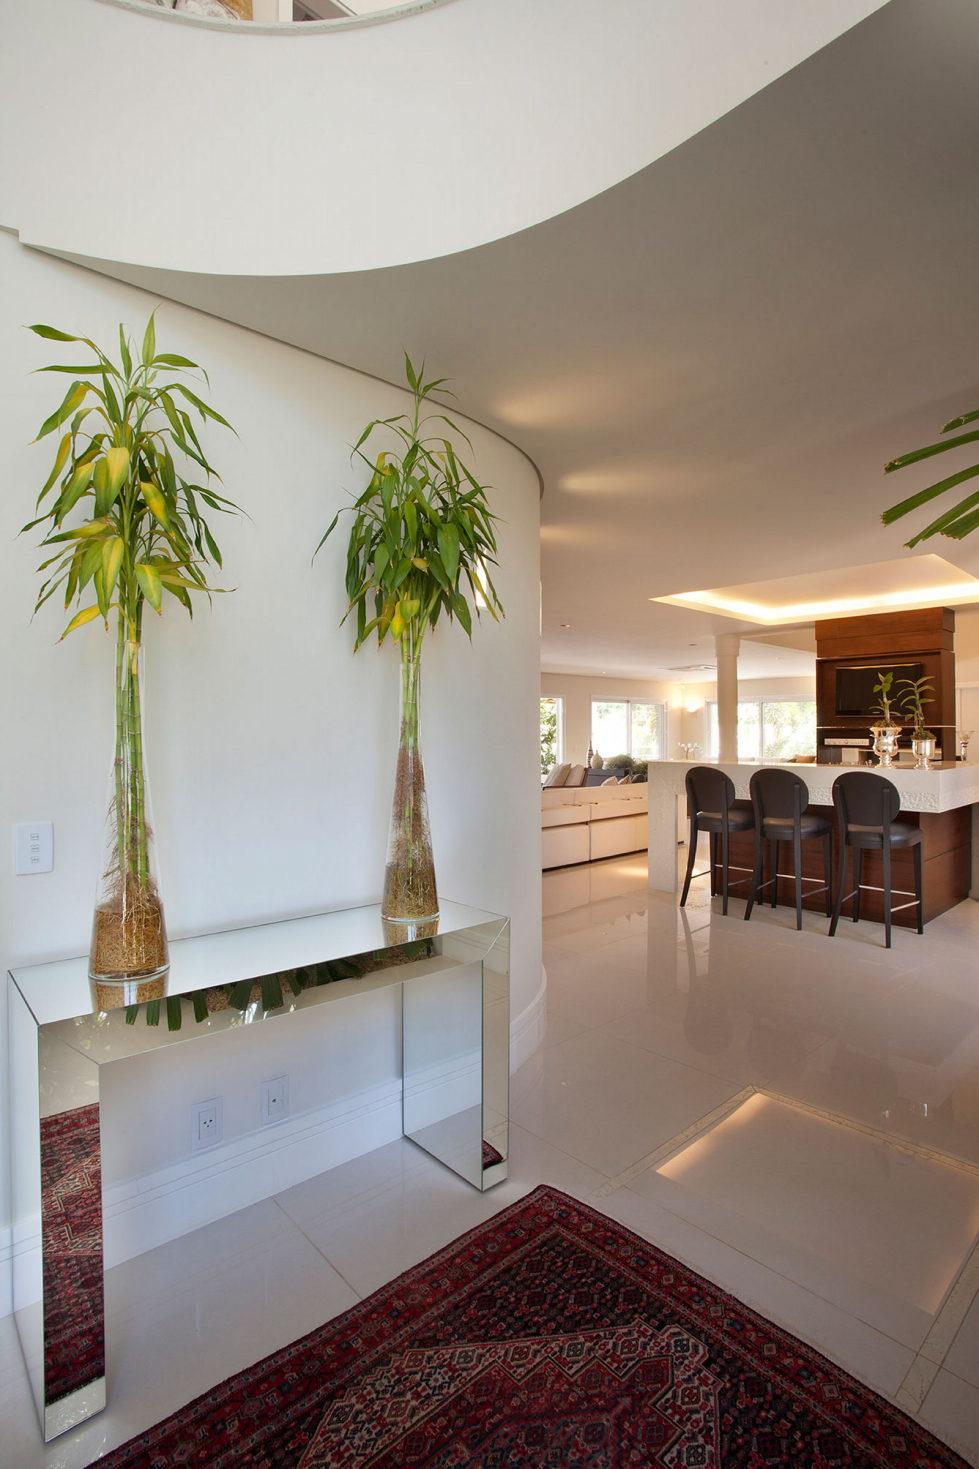 The mansion in Sao Paulo from PUPO + GASPAR Architecture & Interior 25